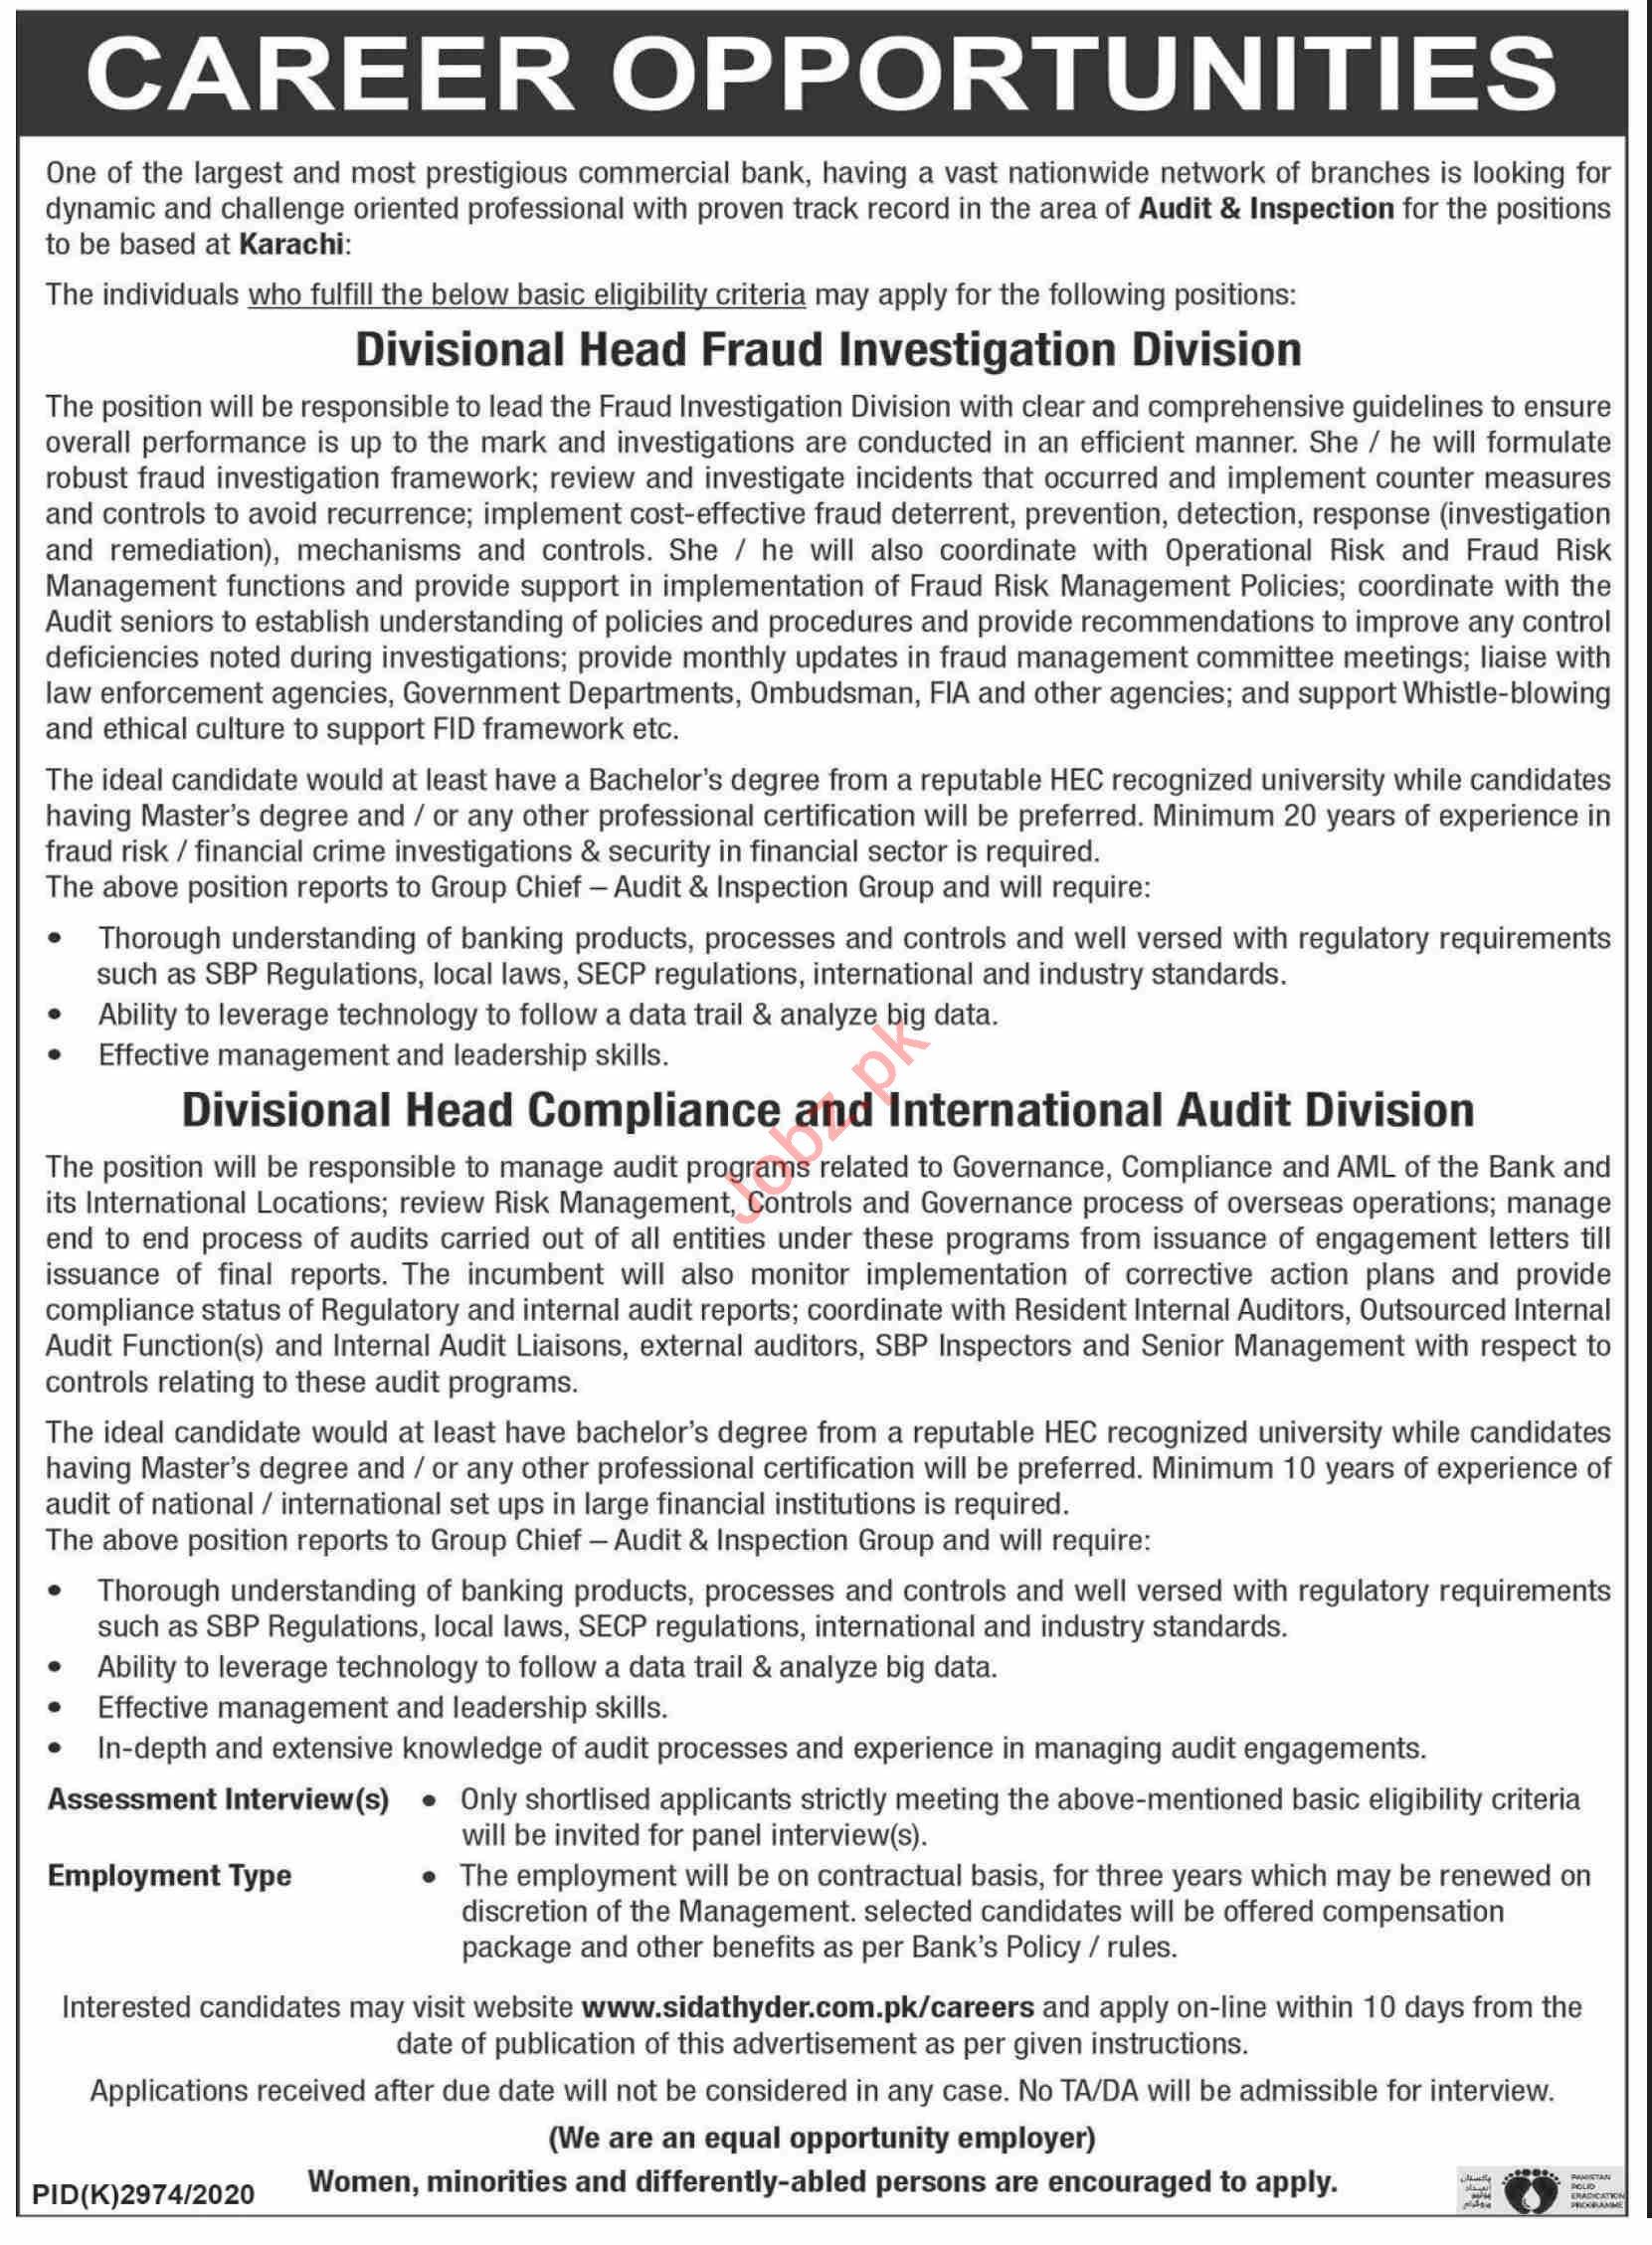 Divisional Head Fraud Investigation Division Jobs 2021